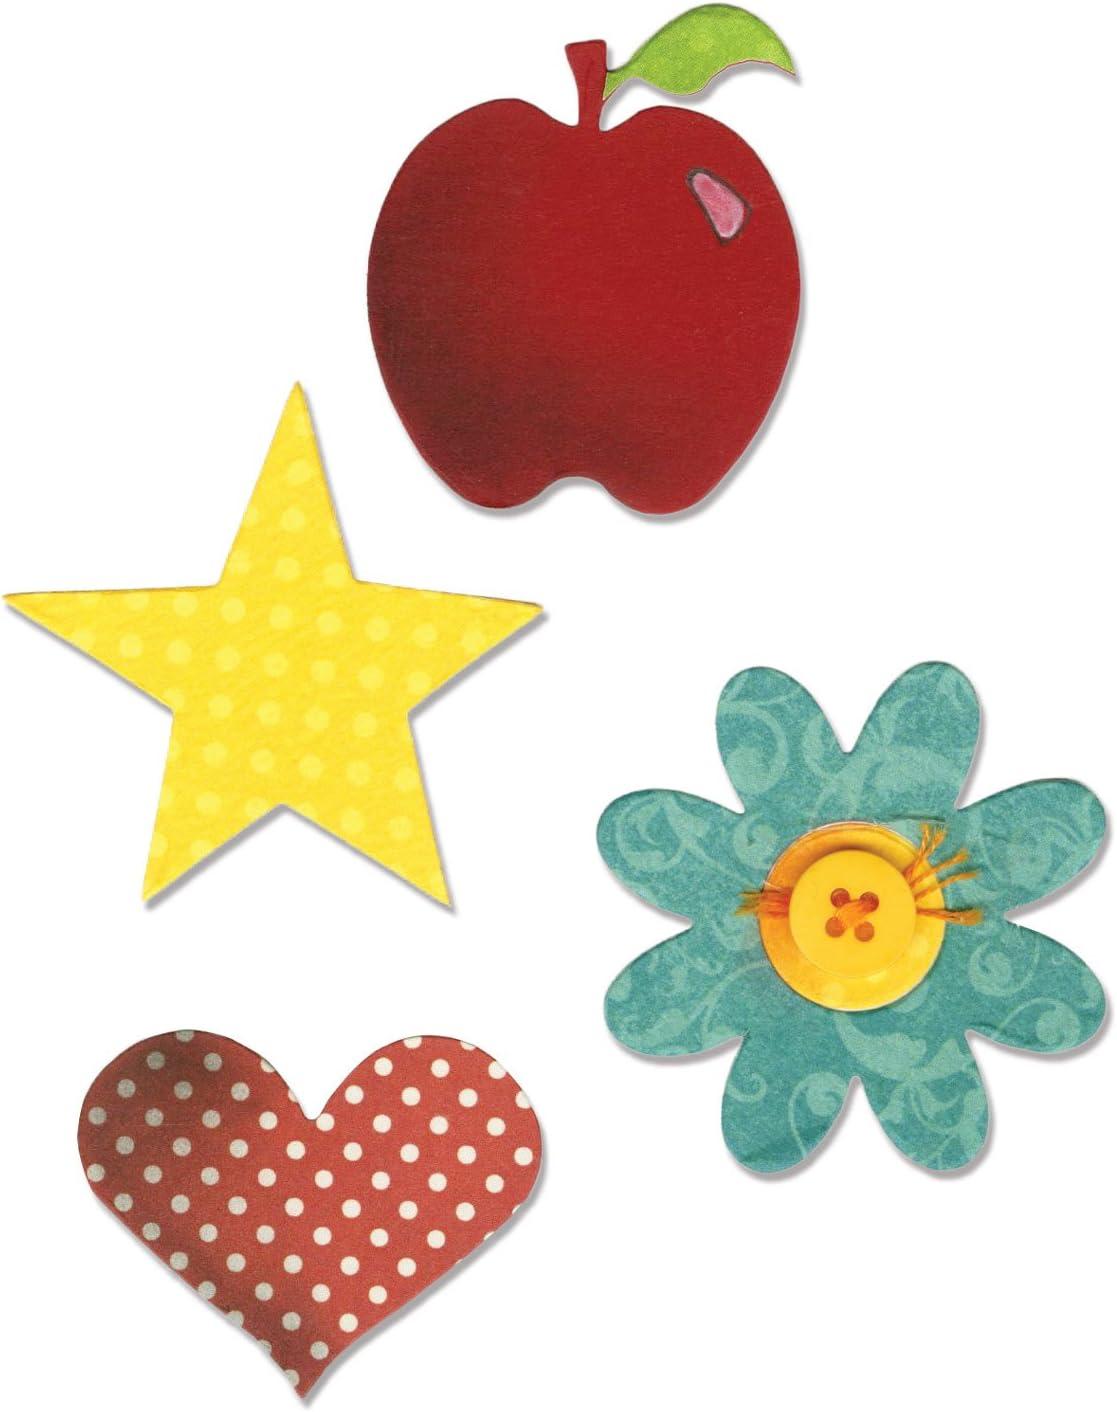 Sizzix A10598 Bigz Die, Apple, Flower, Heart & Star